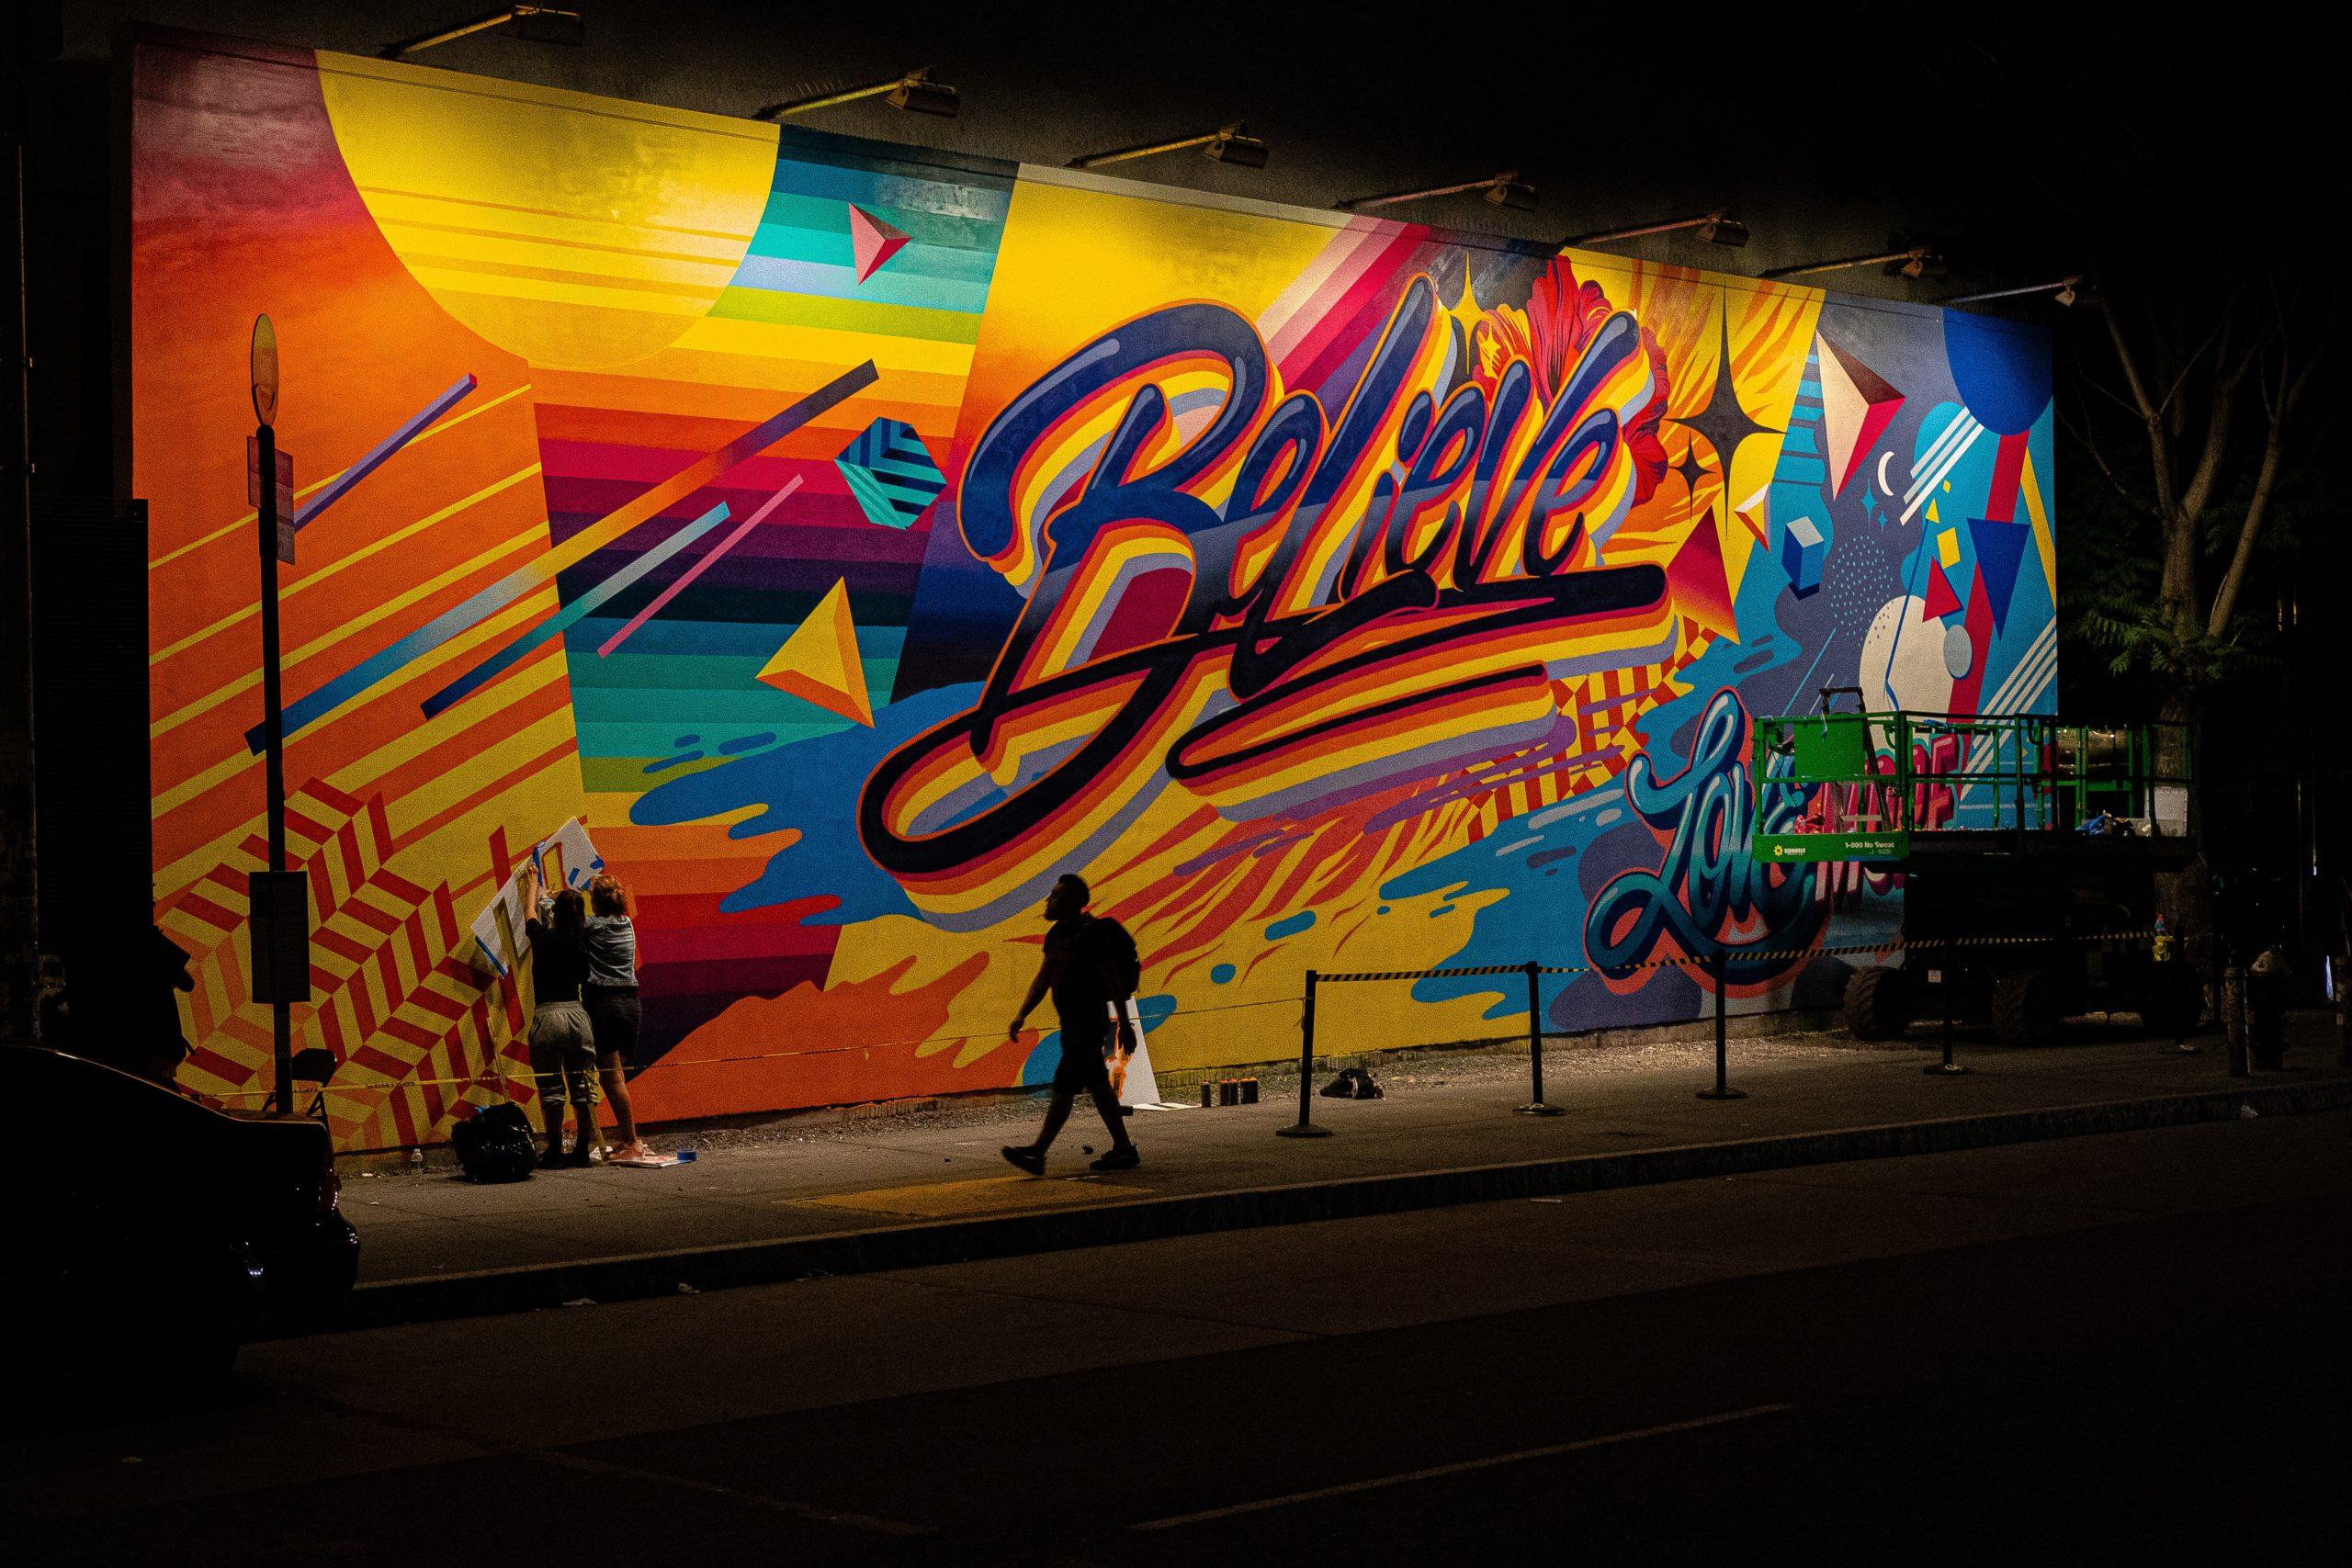 Believe graffiti on a wall